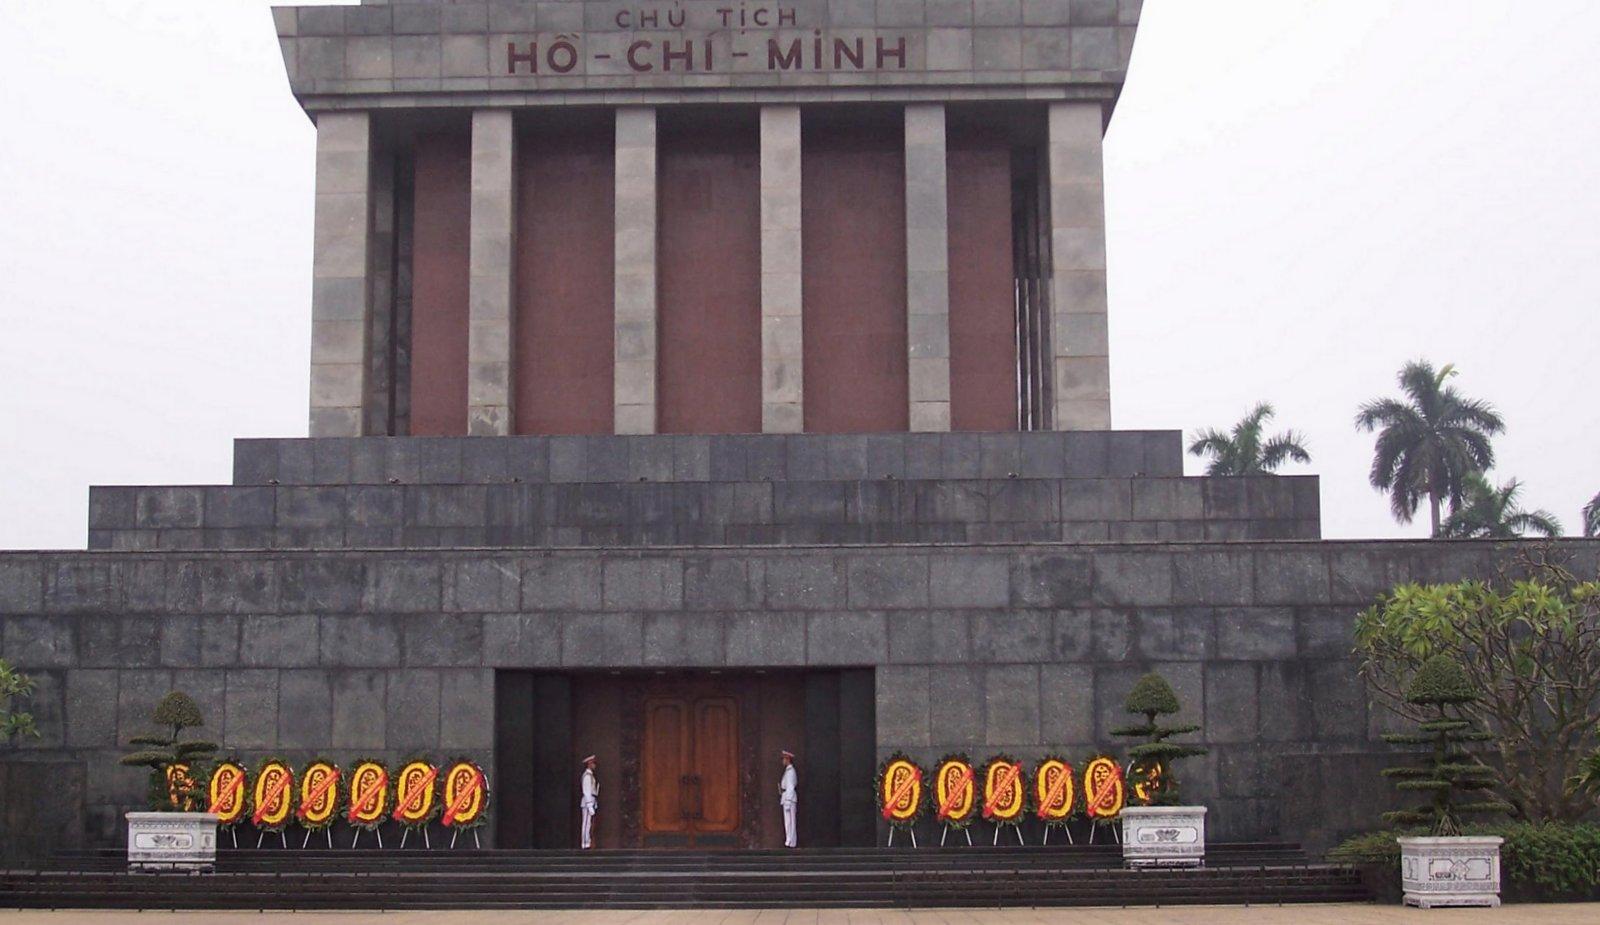 Ho-Chi-Minh Mausoleum - Hanoi